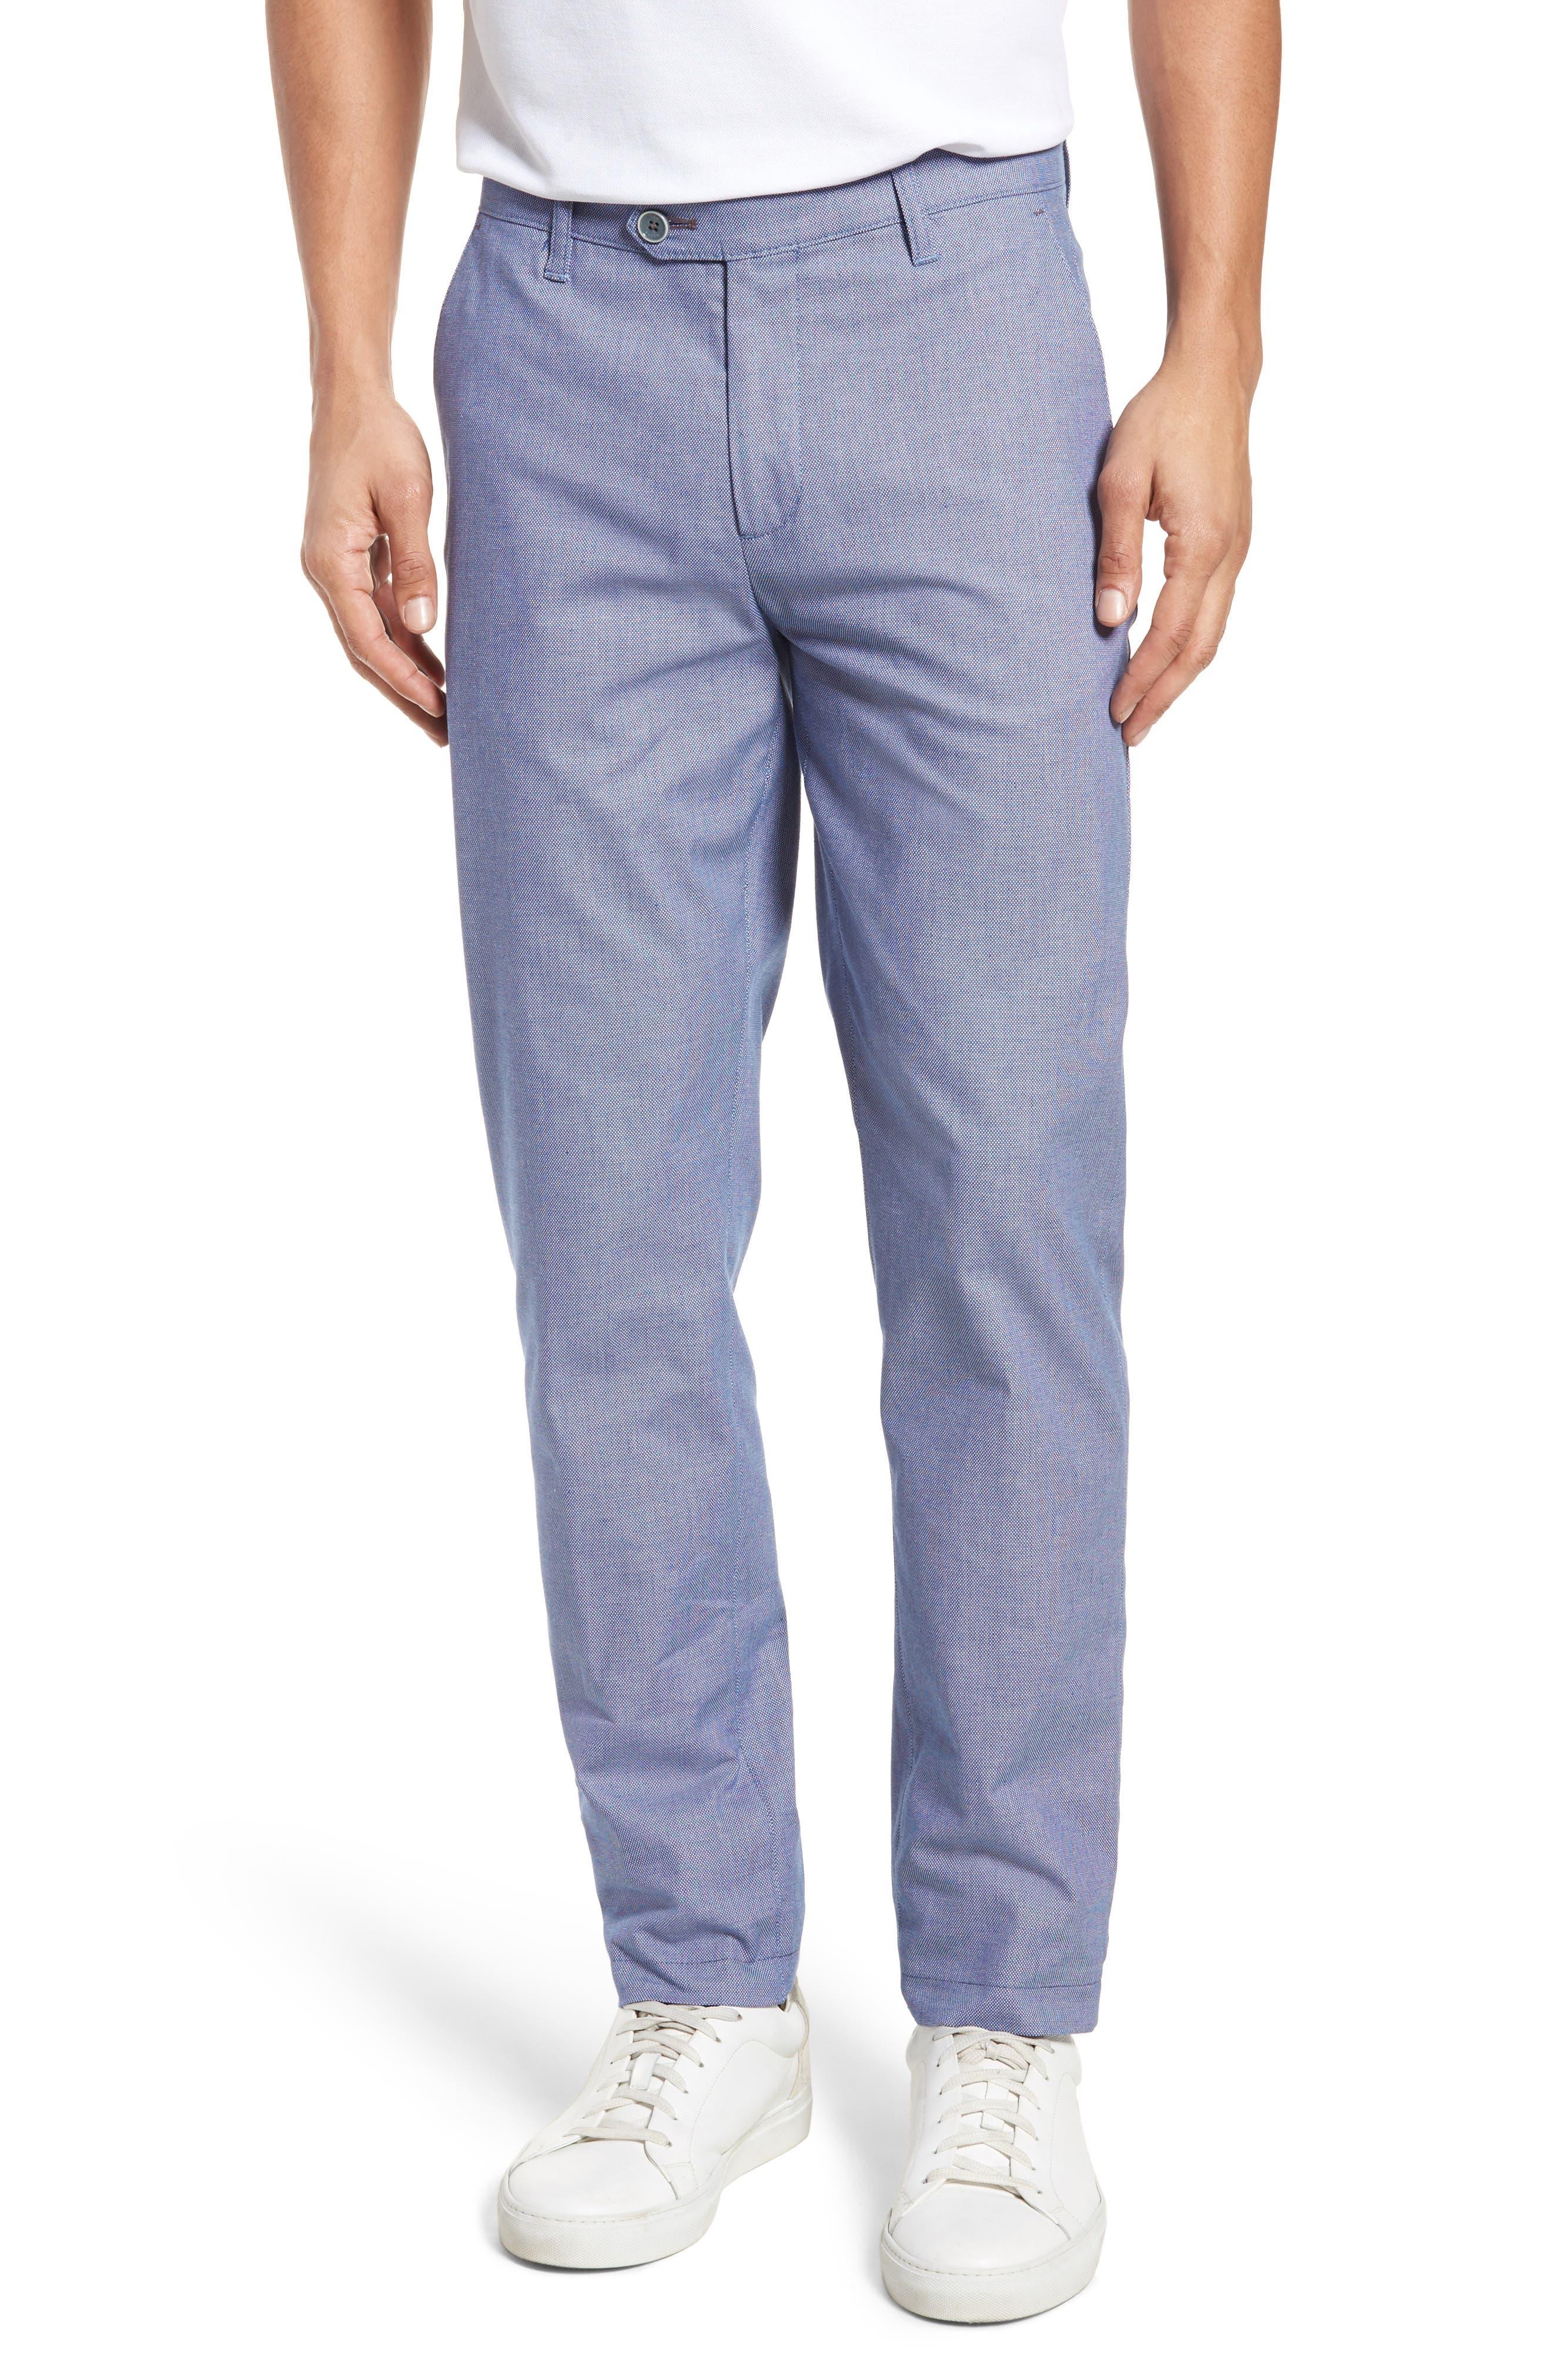 Holldet Flat Front Stretch Solid Cotton Pants,                         Main,                         color, Light Blue